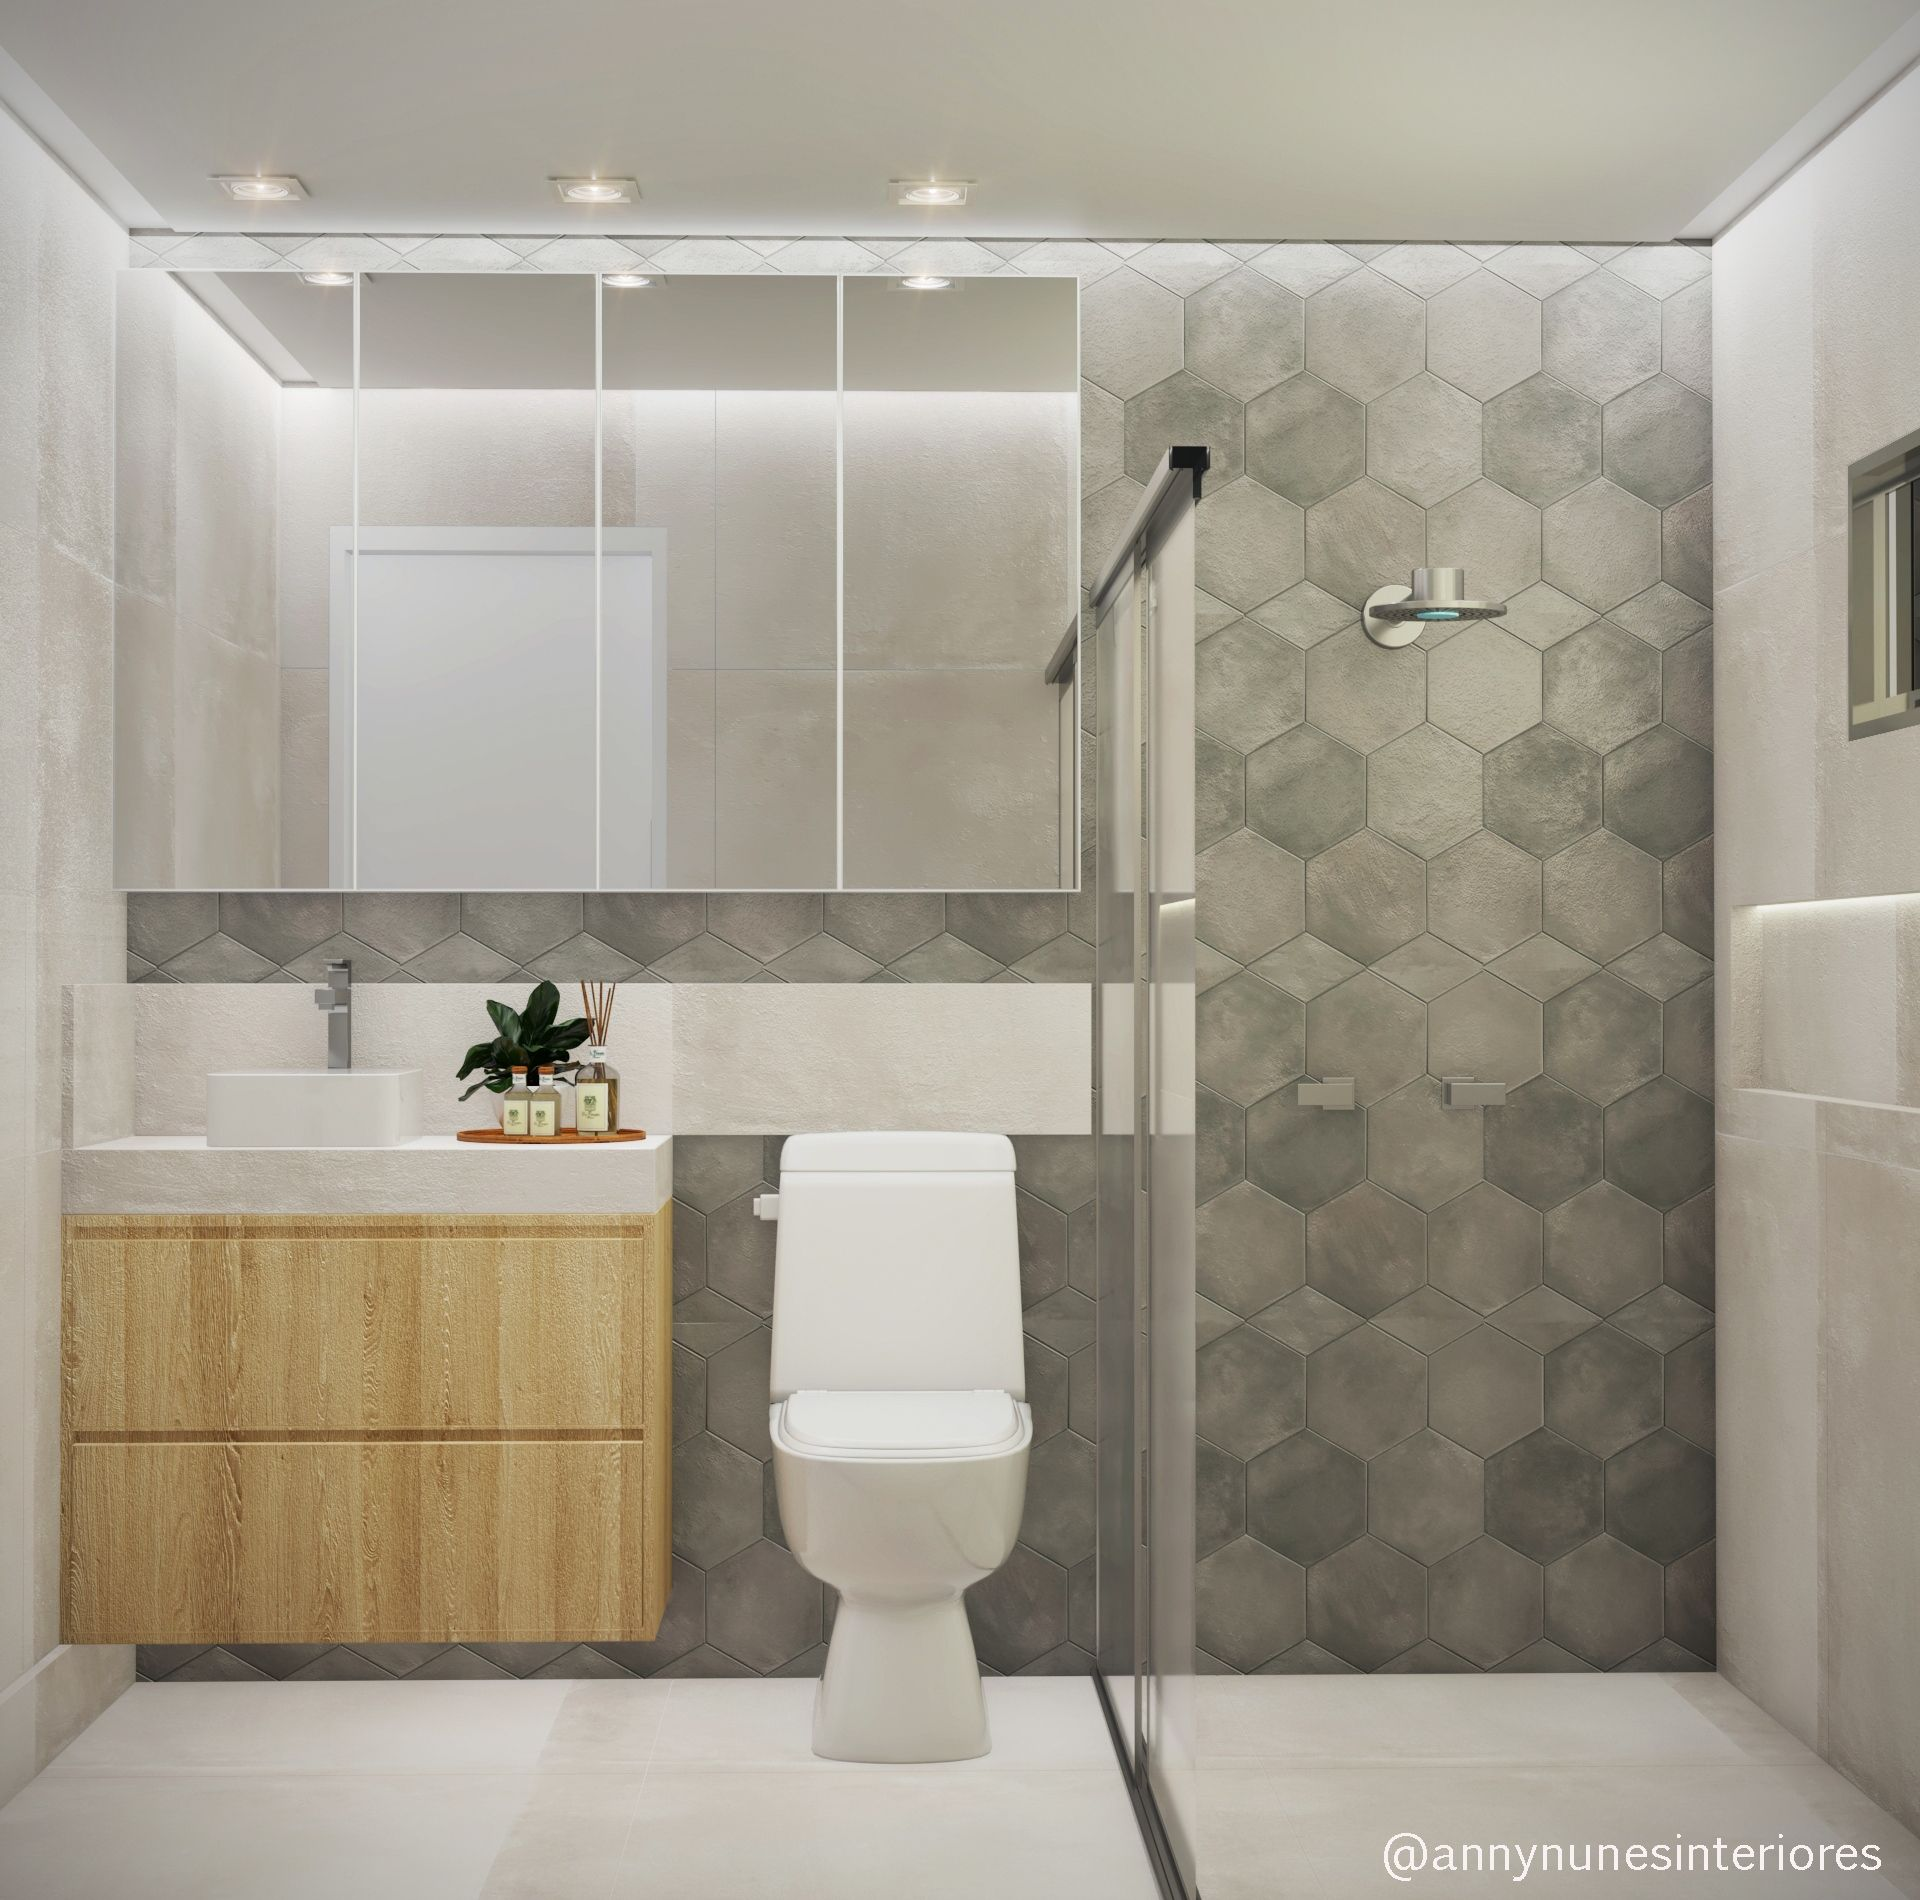 Industrial Interiordesign Bathroom: #wc #banheiro #casaljovem #jovemcasal # Interiordesign